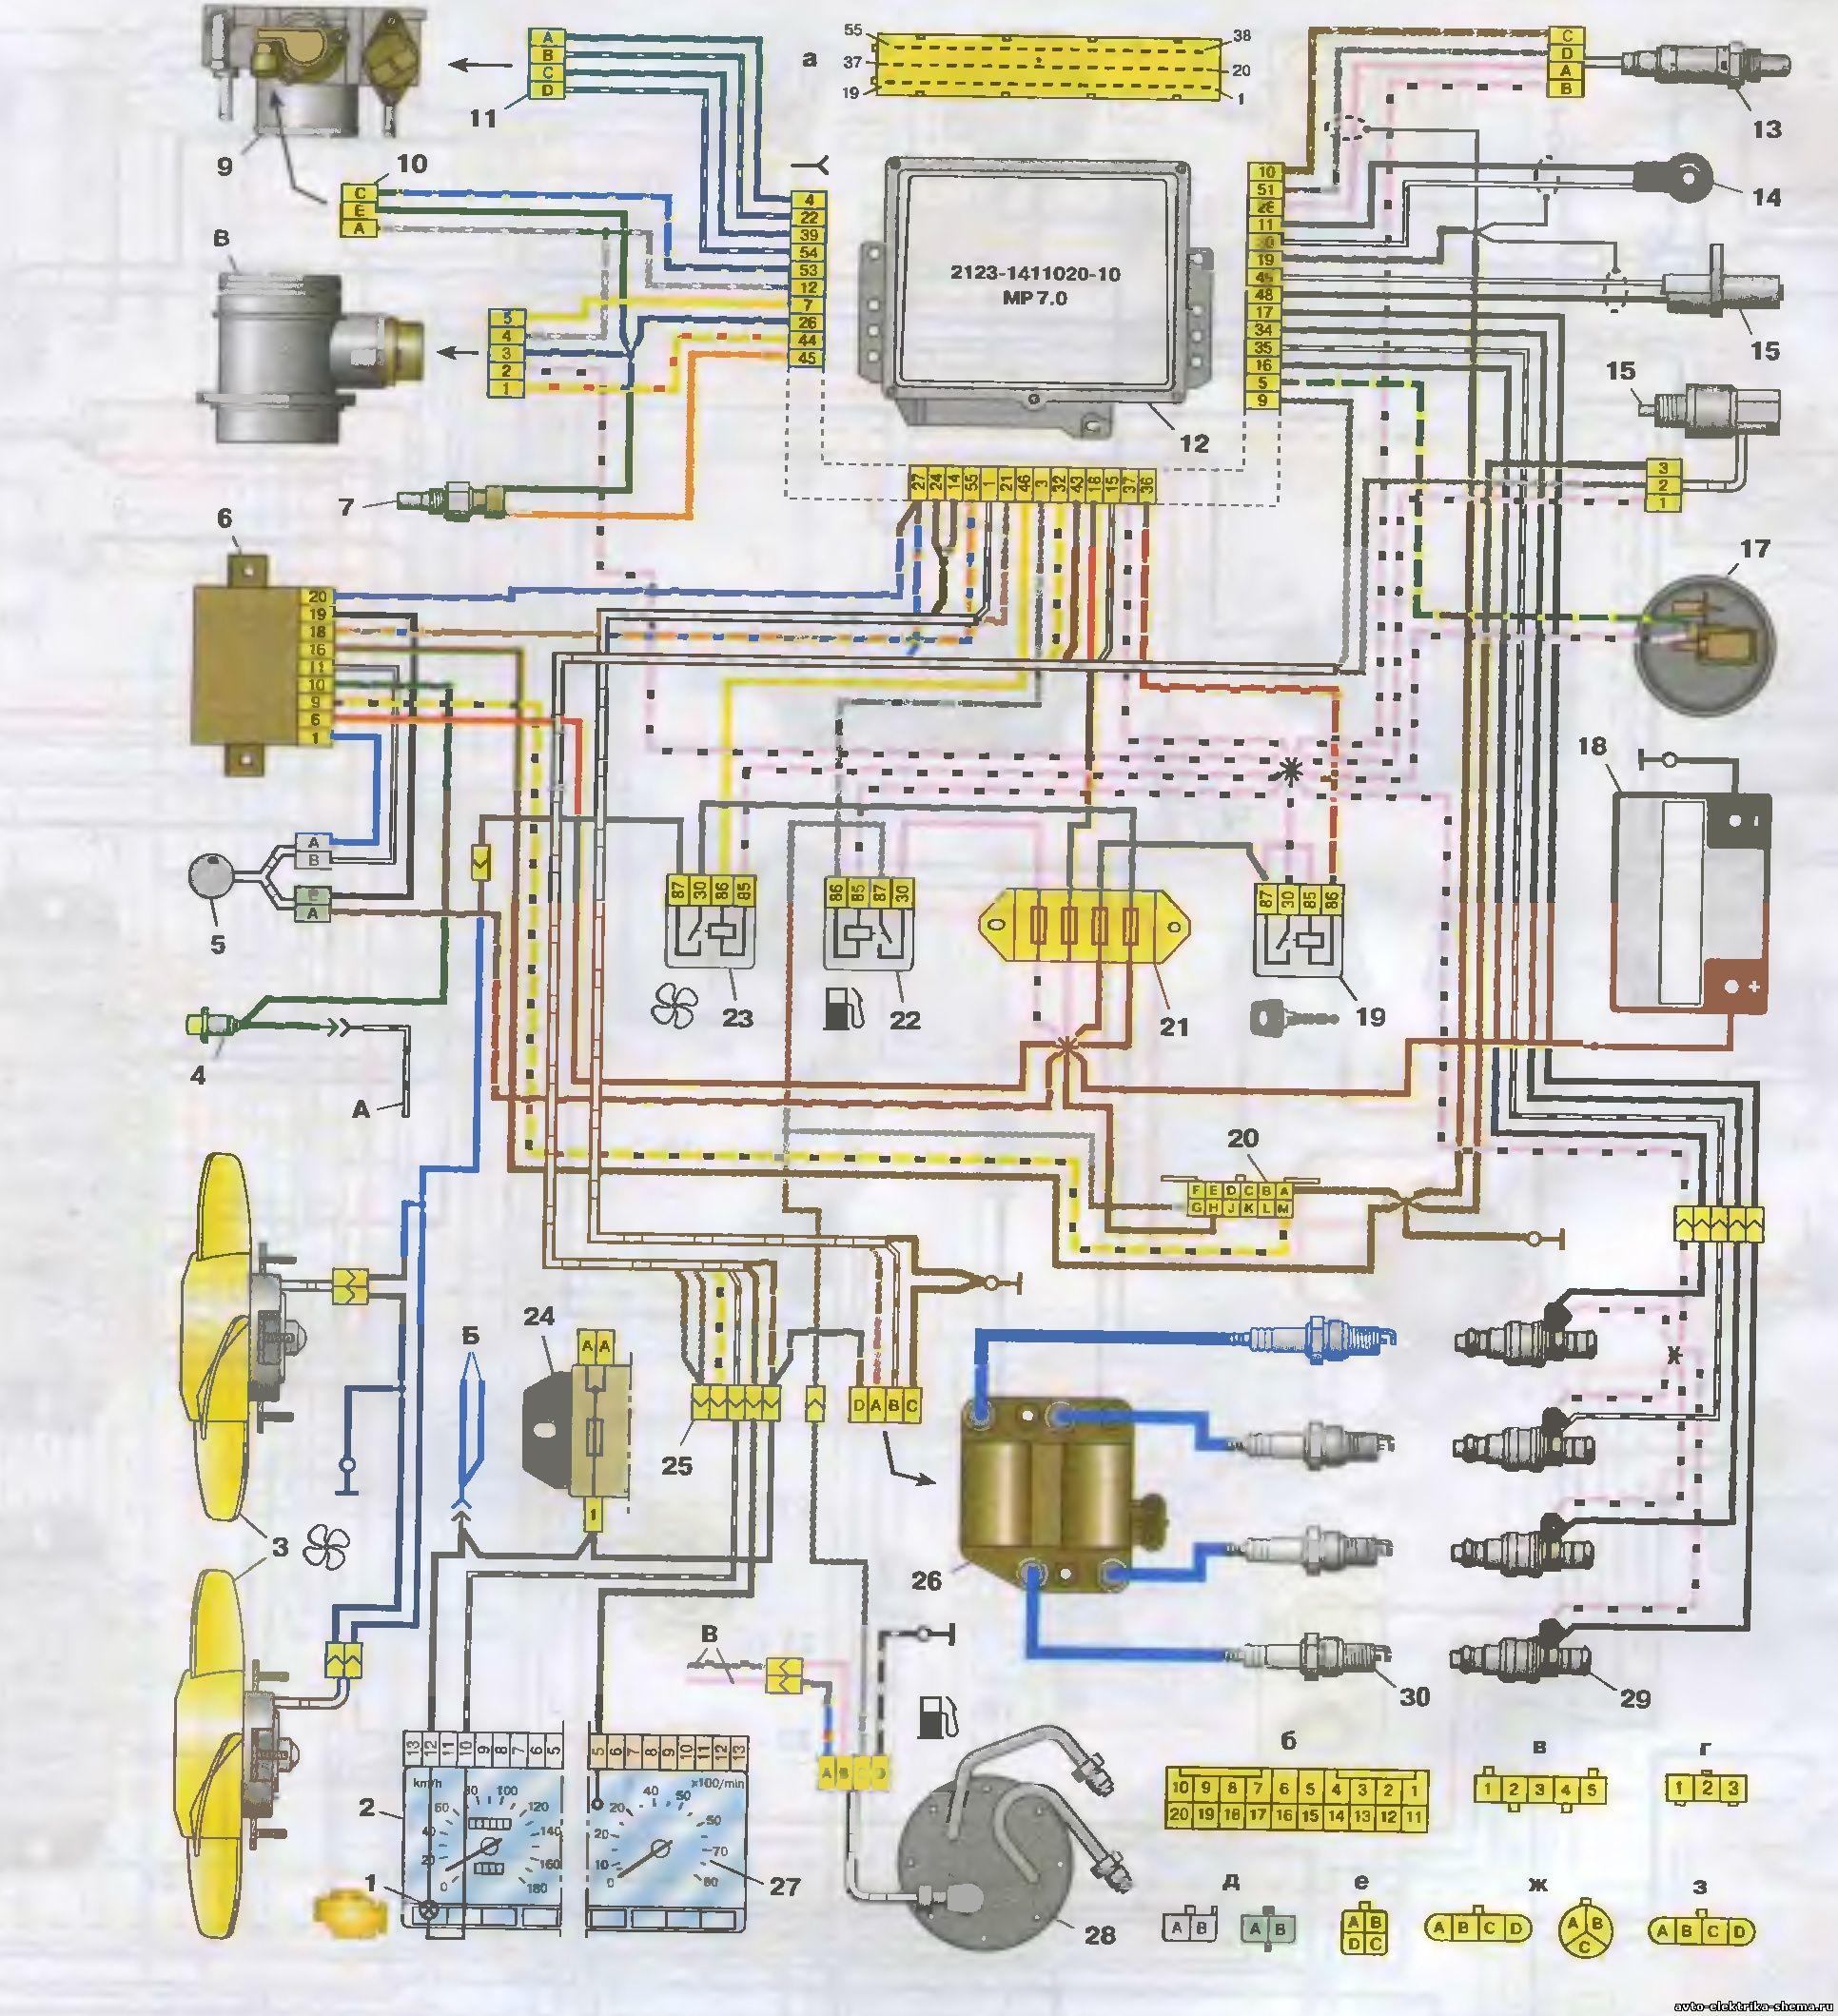 21214 e2 - Схема электрооборудования ваз 2121 нива карбюратор